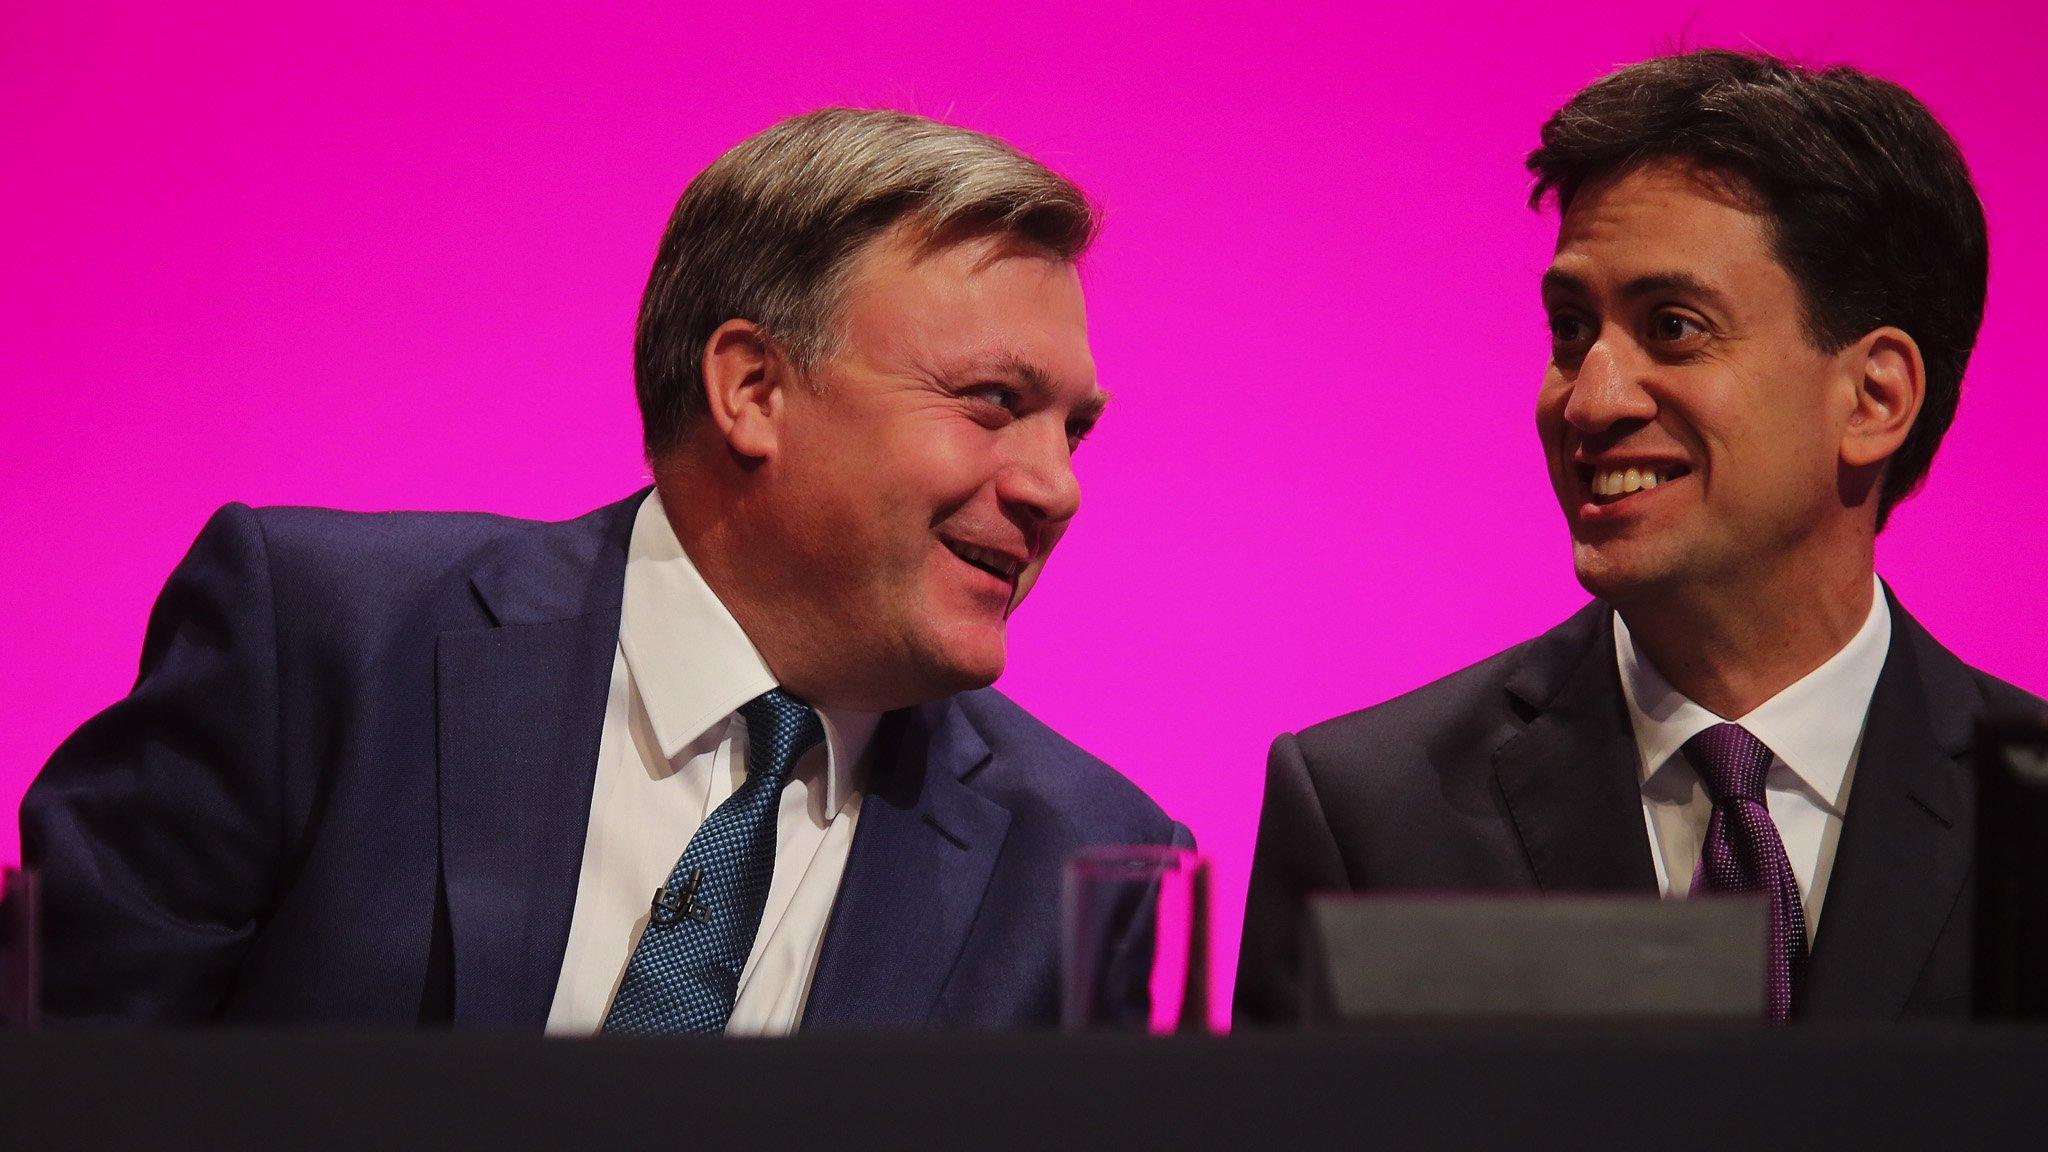 Miliband faces dilemma over chancellor choice